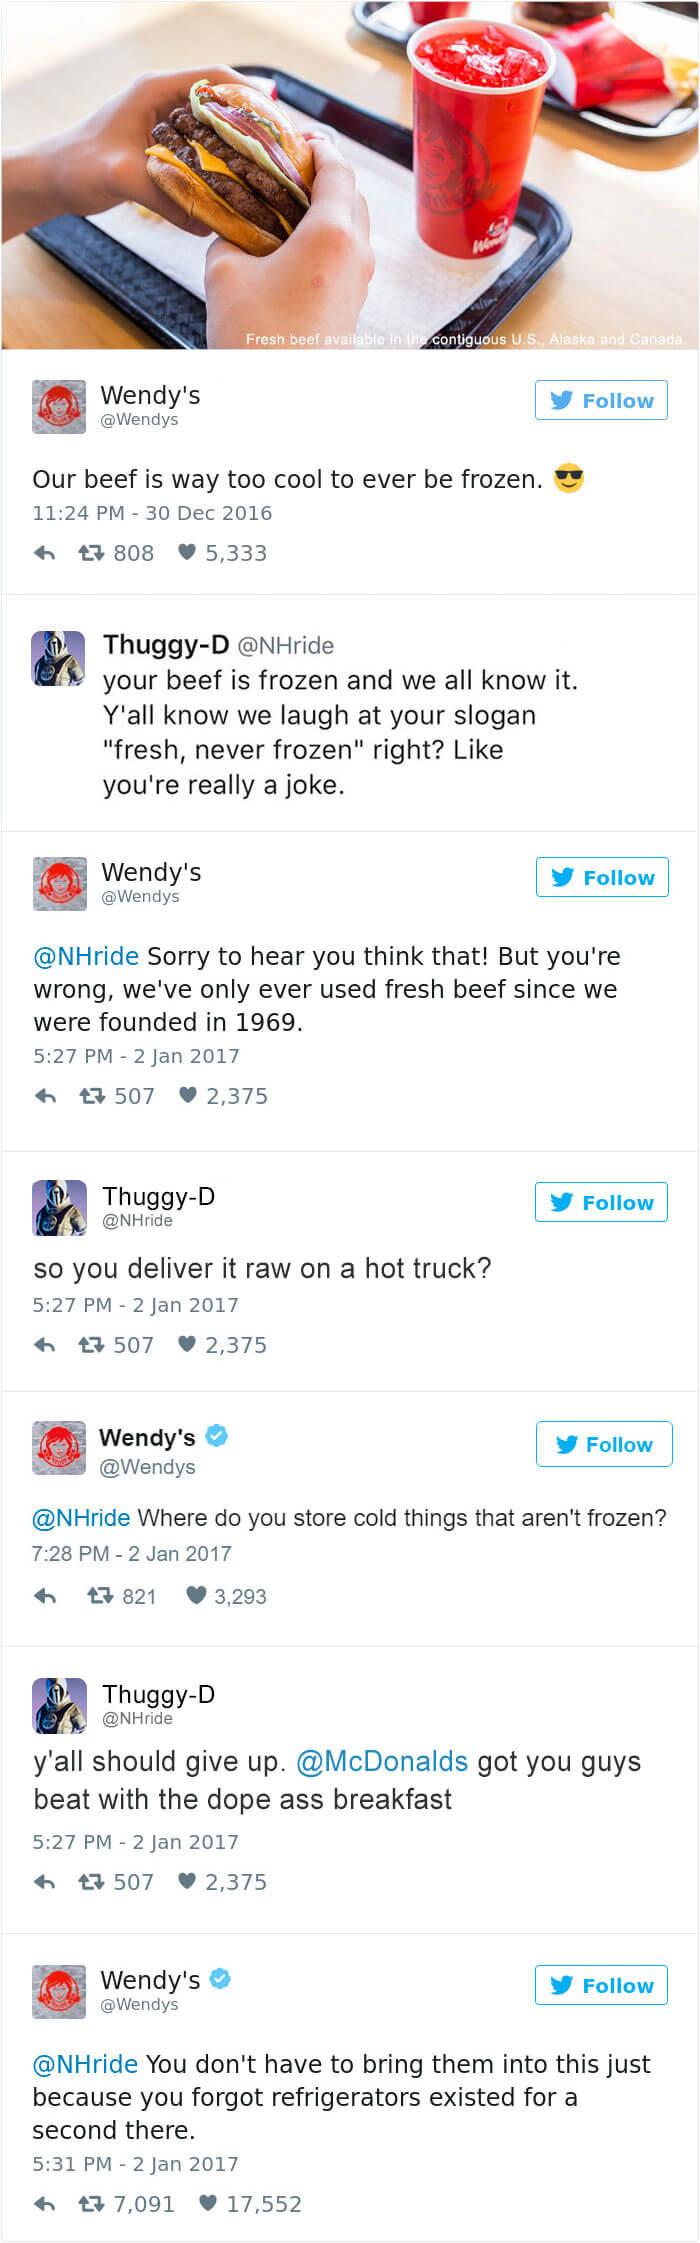 wendy's twitter roasts 2